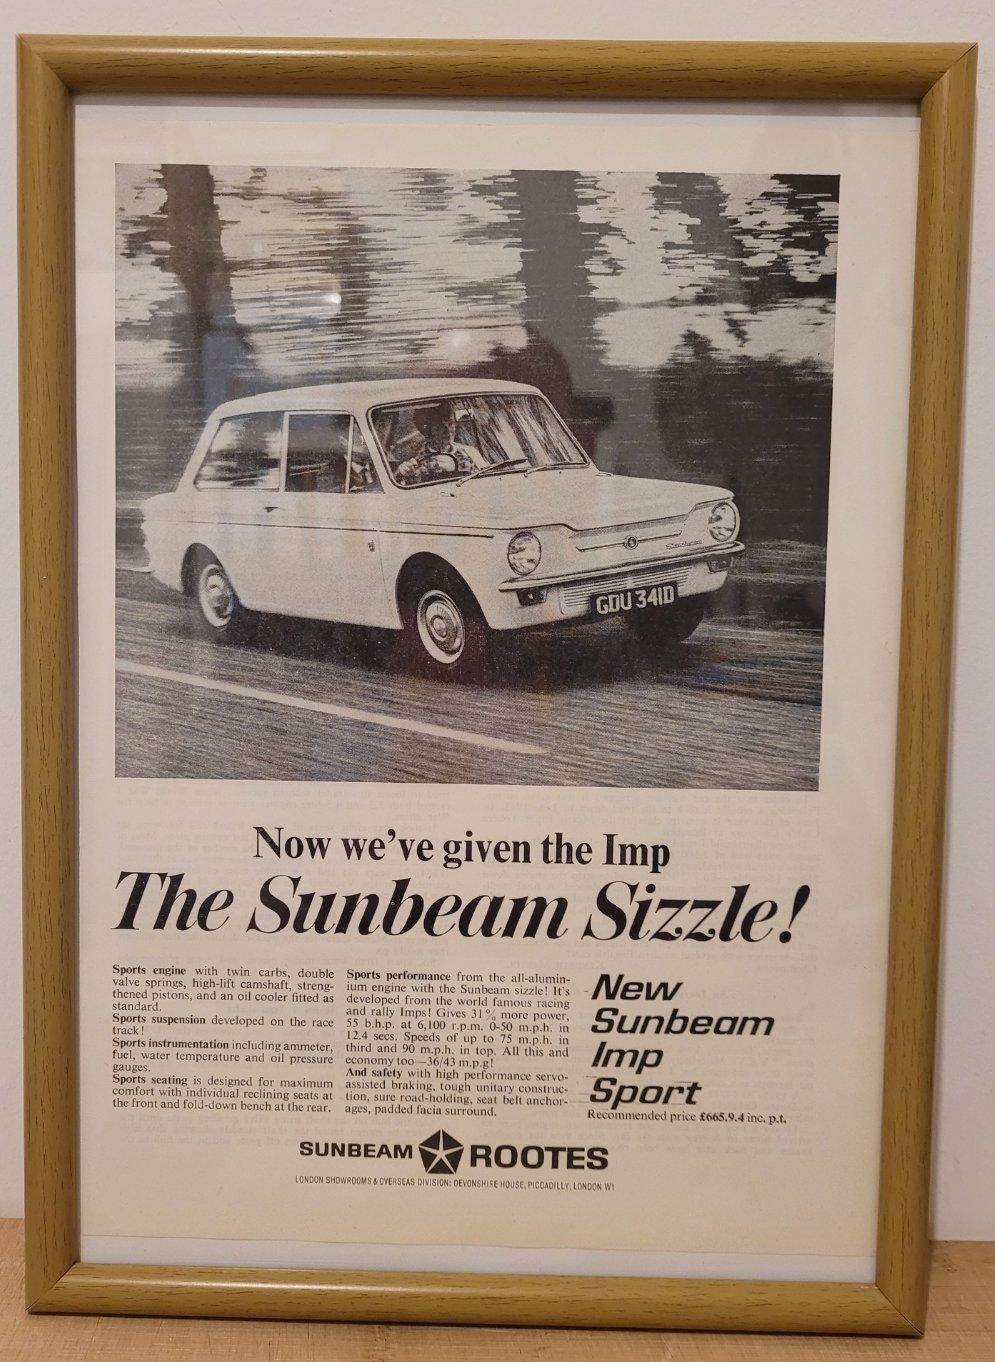 Picture of 1983 Original 1966 Sunbeam Imp Sport Framed Advert